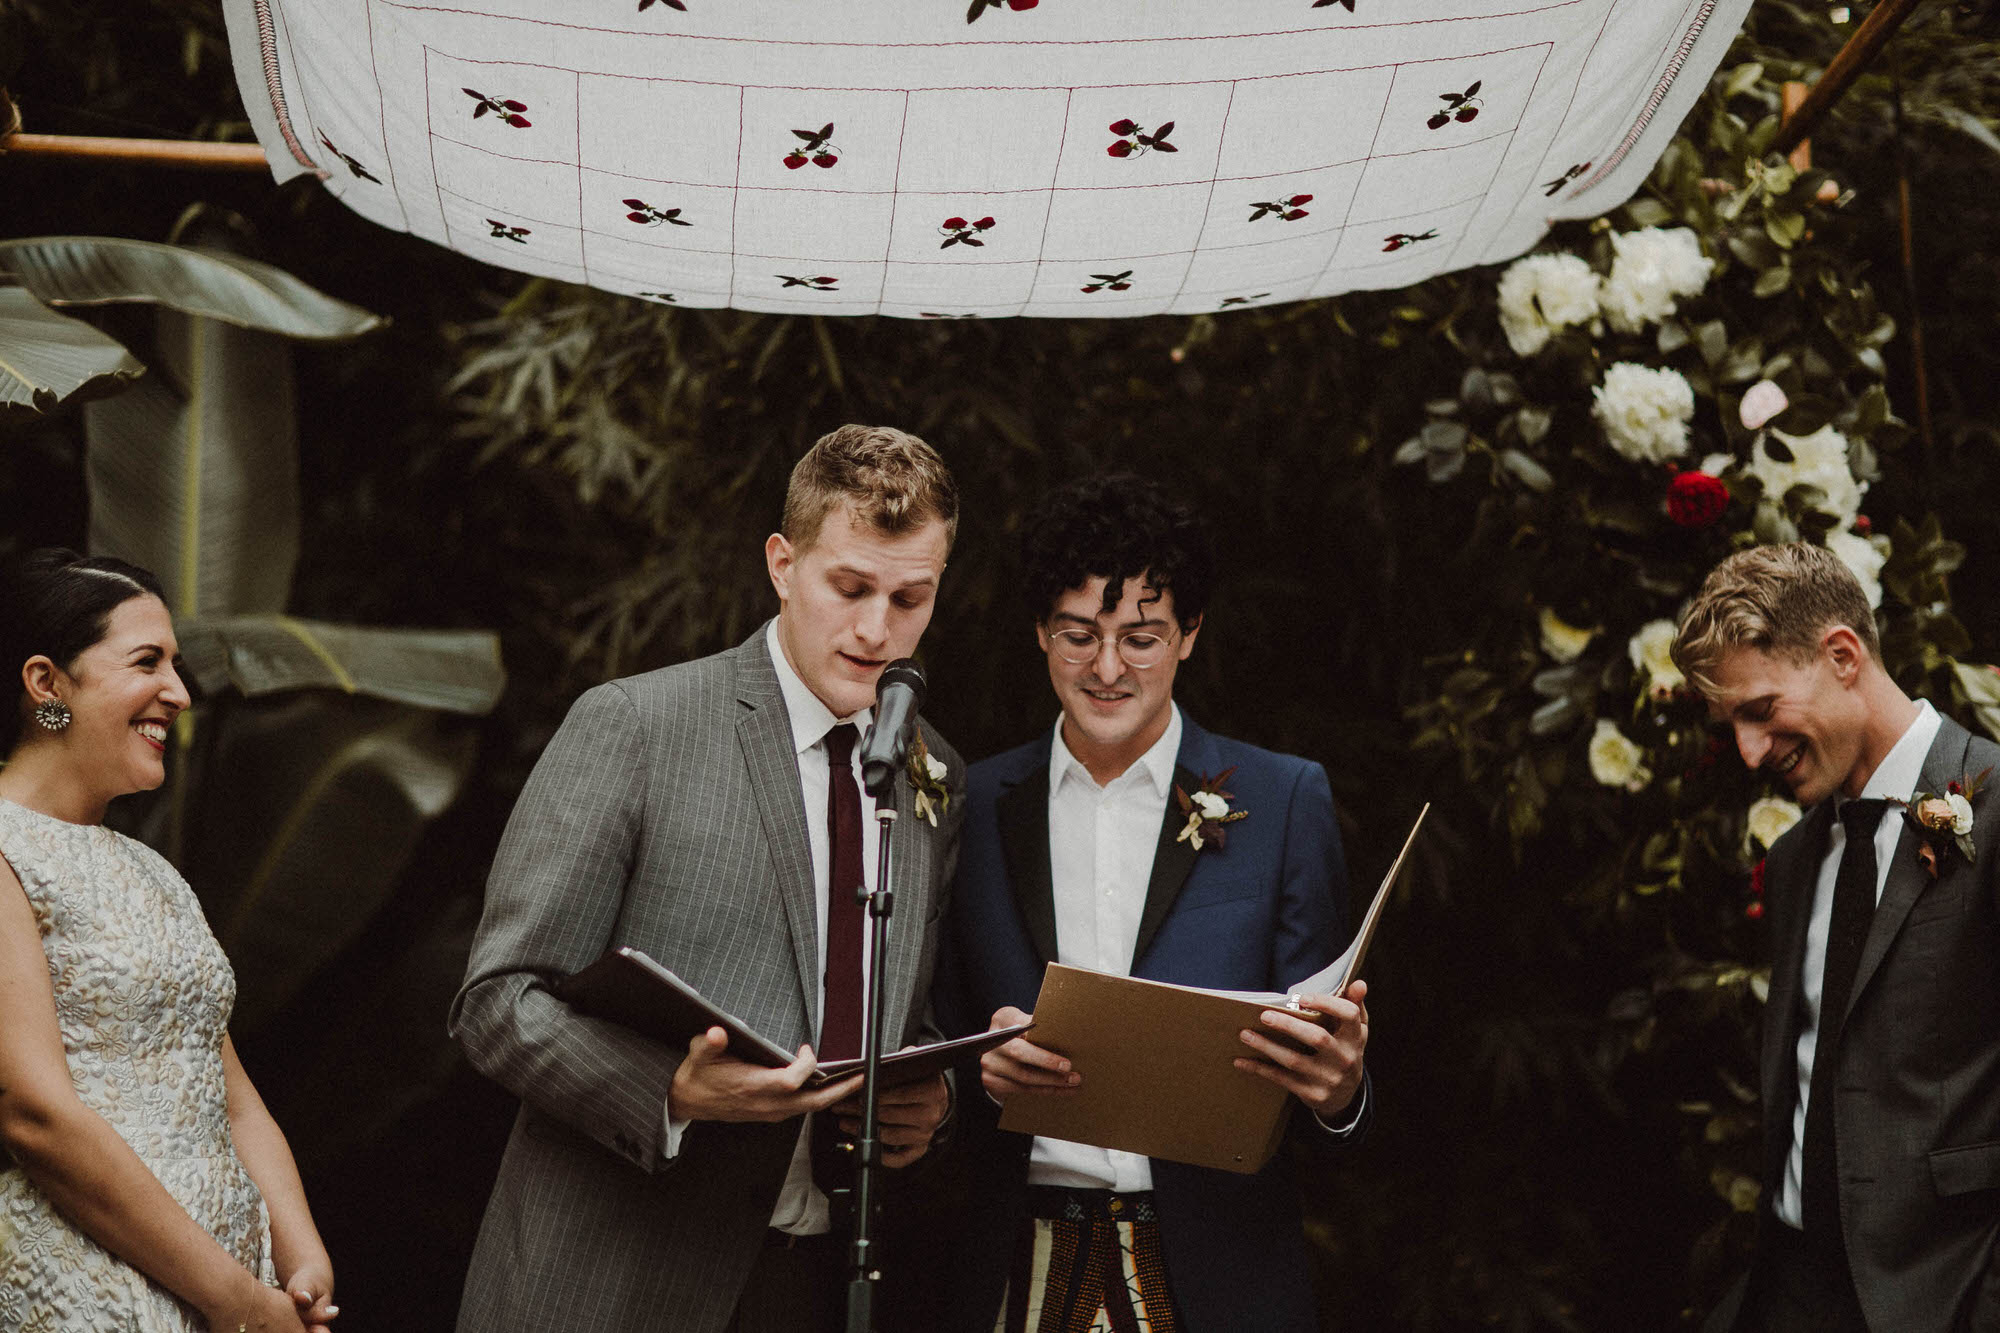 los-angeles-wedding-photographer-millwick-106.jpg